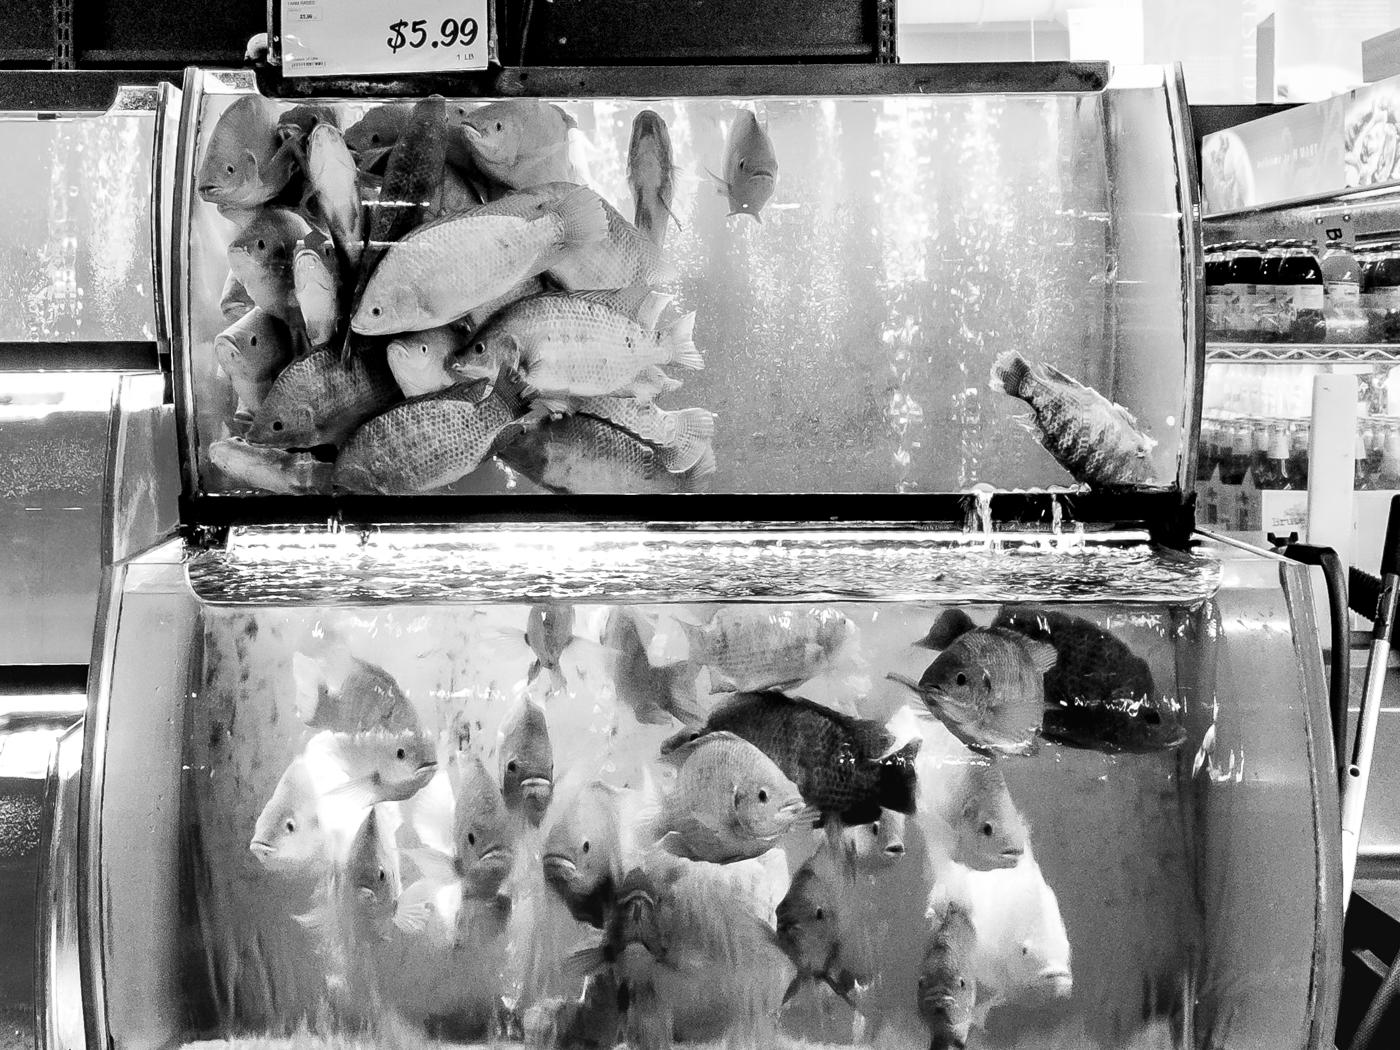 190210_DeadFish_Hmart_135535.jpg